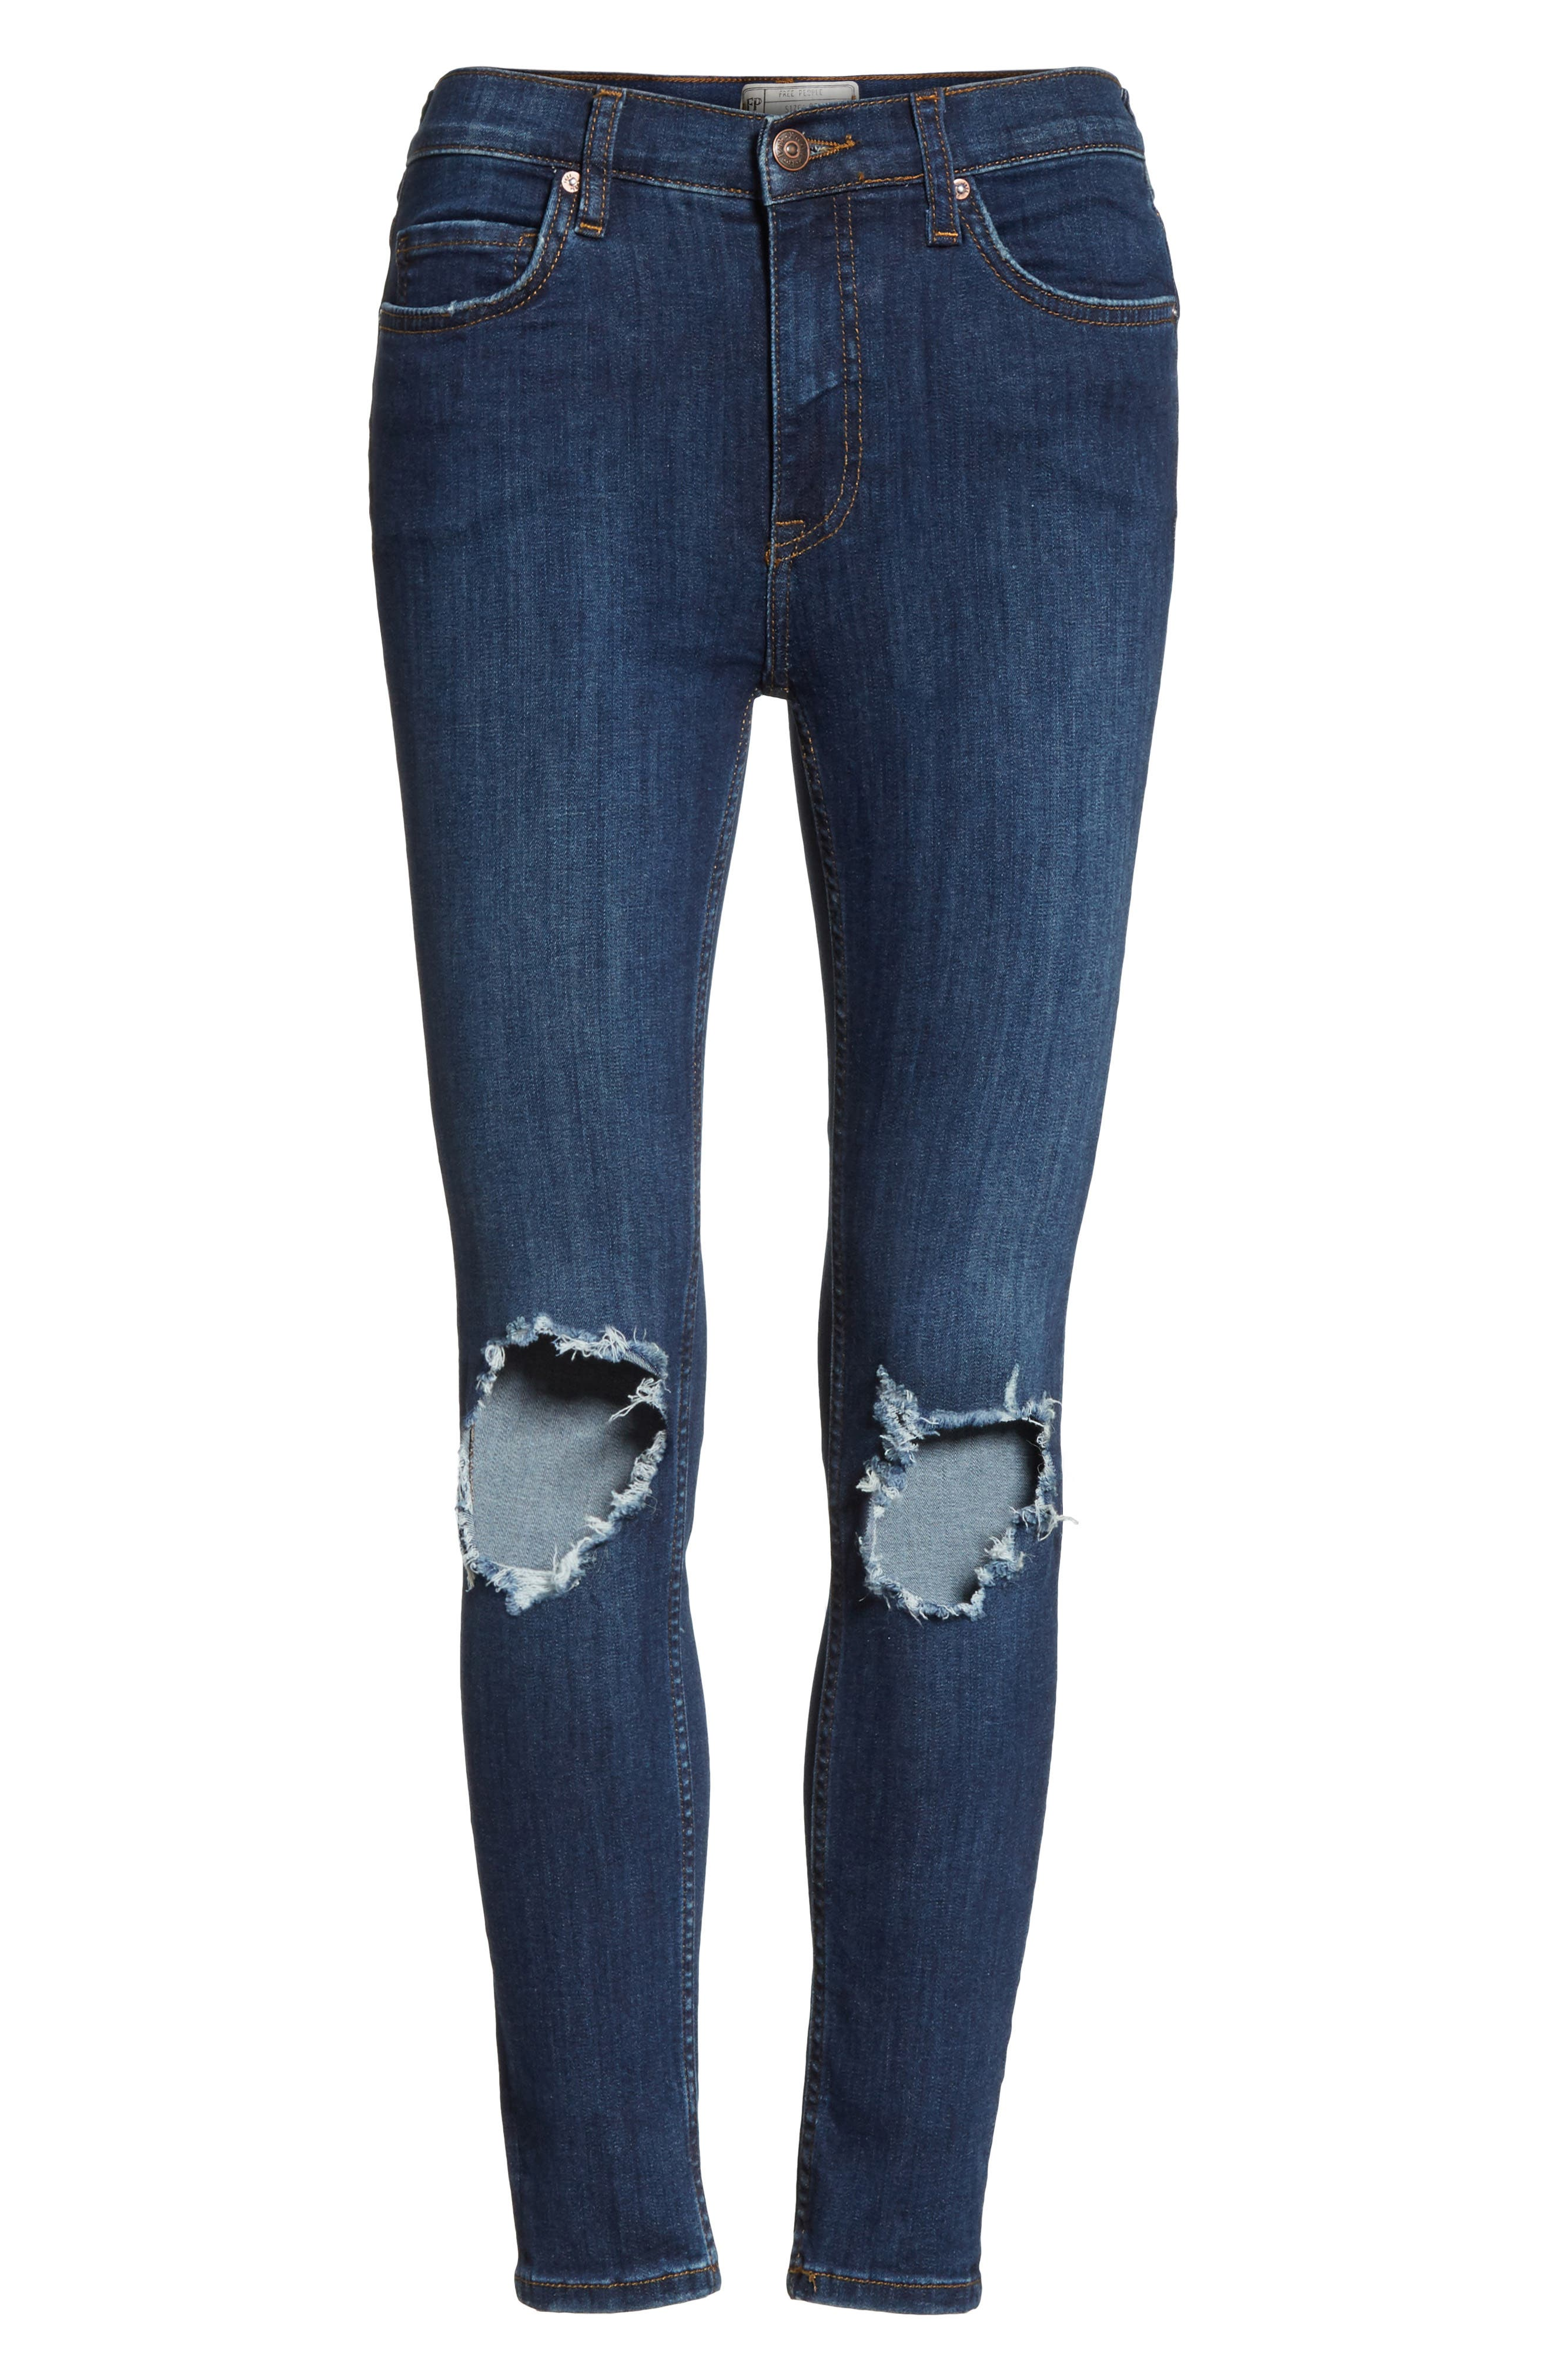 High Waist Ankle Skinny Jeans,                             Alternate thumbnail 7, color,                             Dark Blue